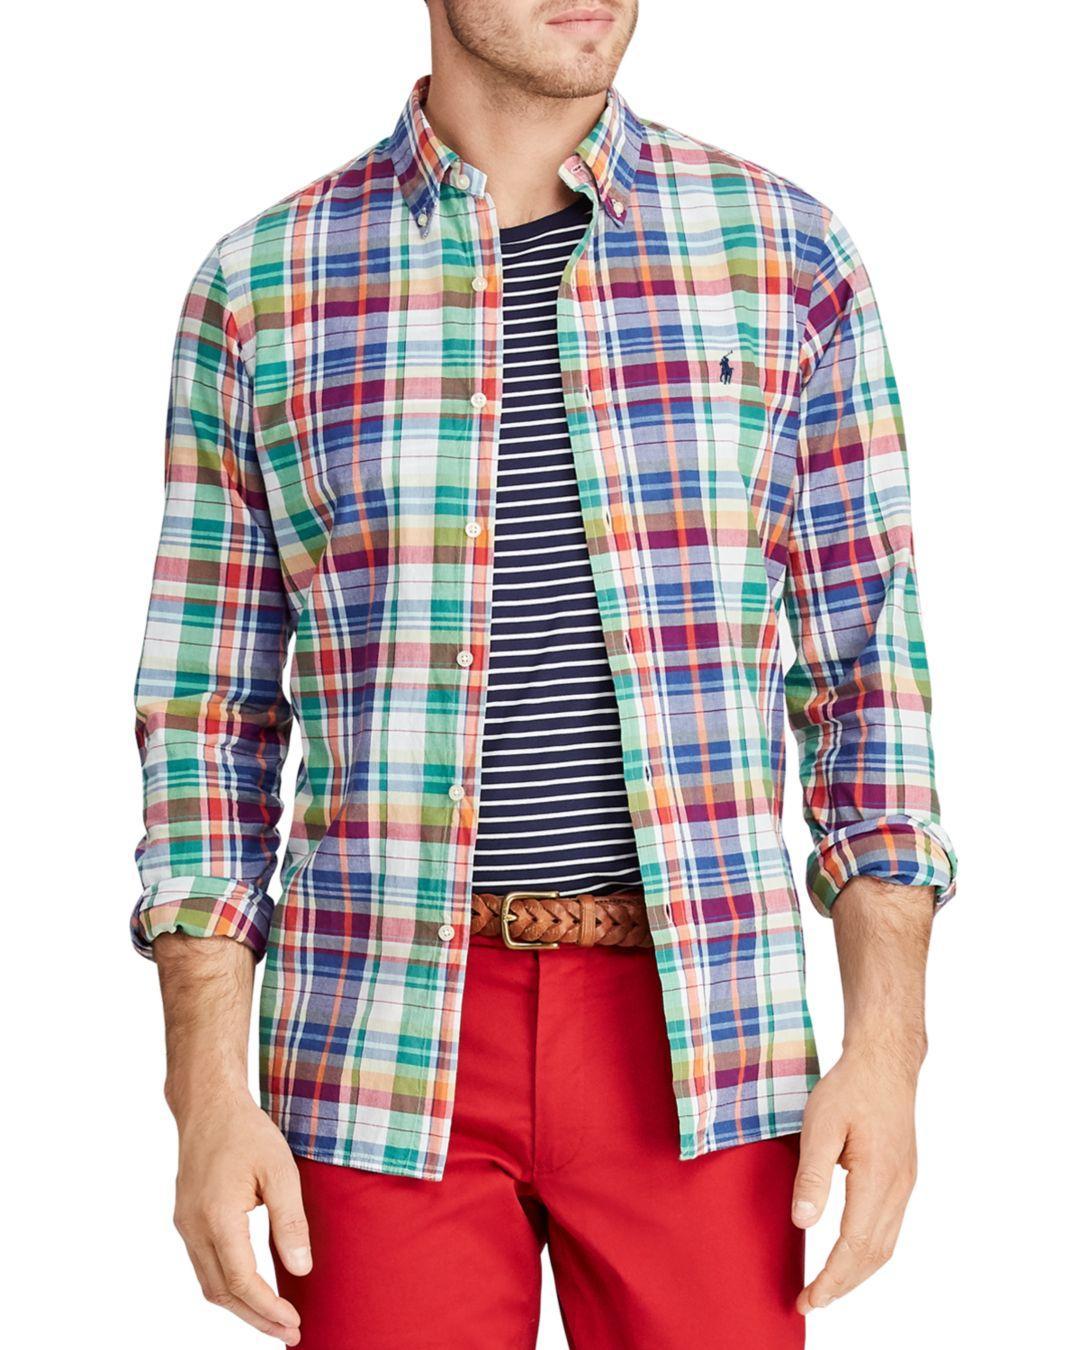 d988519b96d4 Lyst - Polo Ralph Lauren Classic Fit Button-down Madras Shirt in Red ...